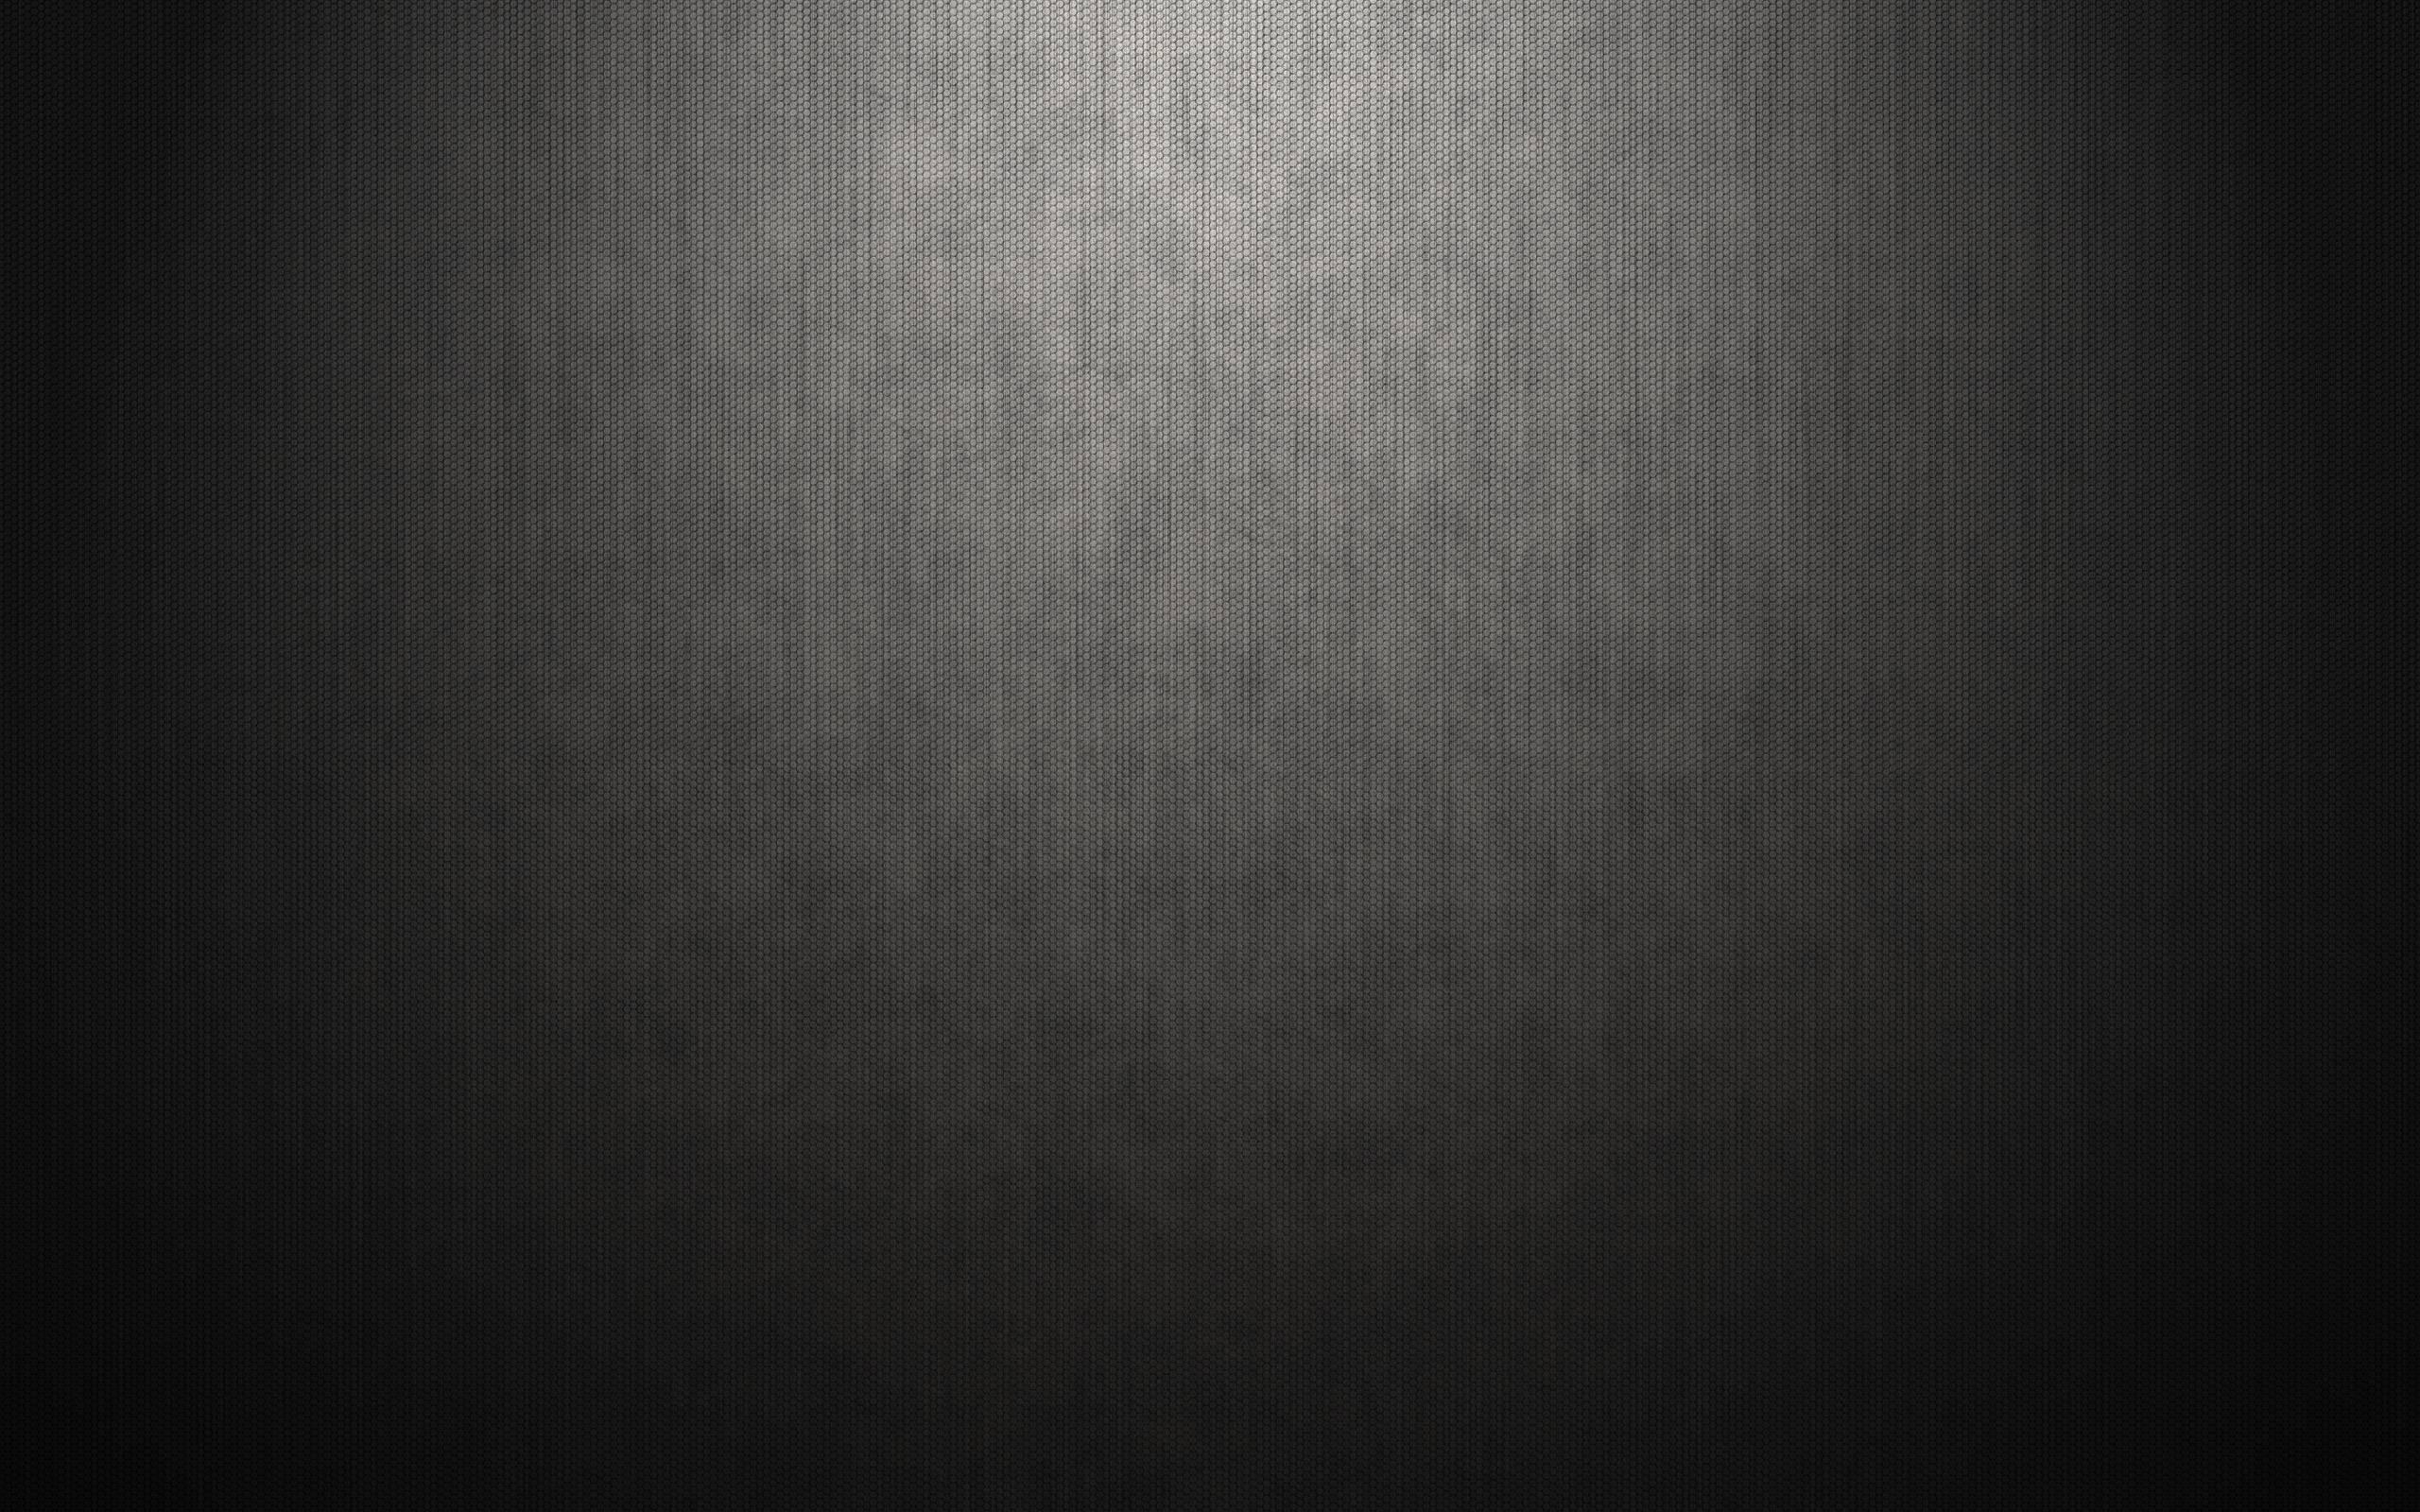 Dark Gray background ·â' Download free wallpapers for desktop